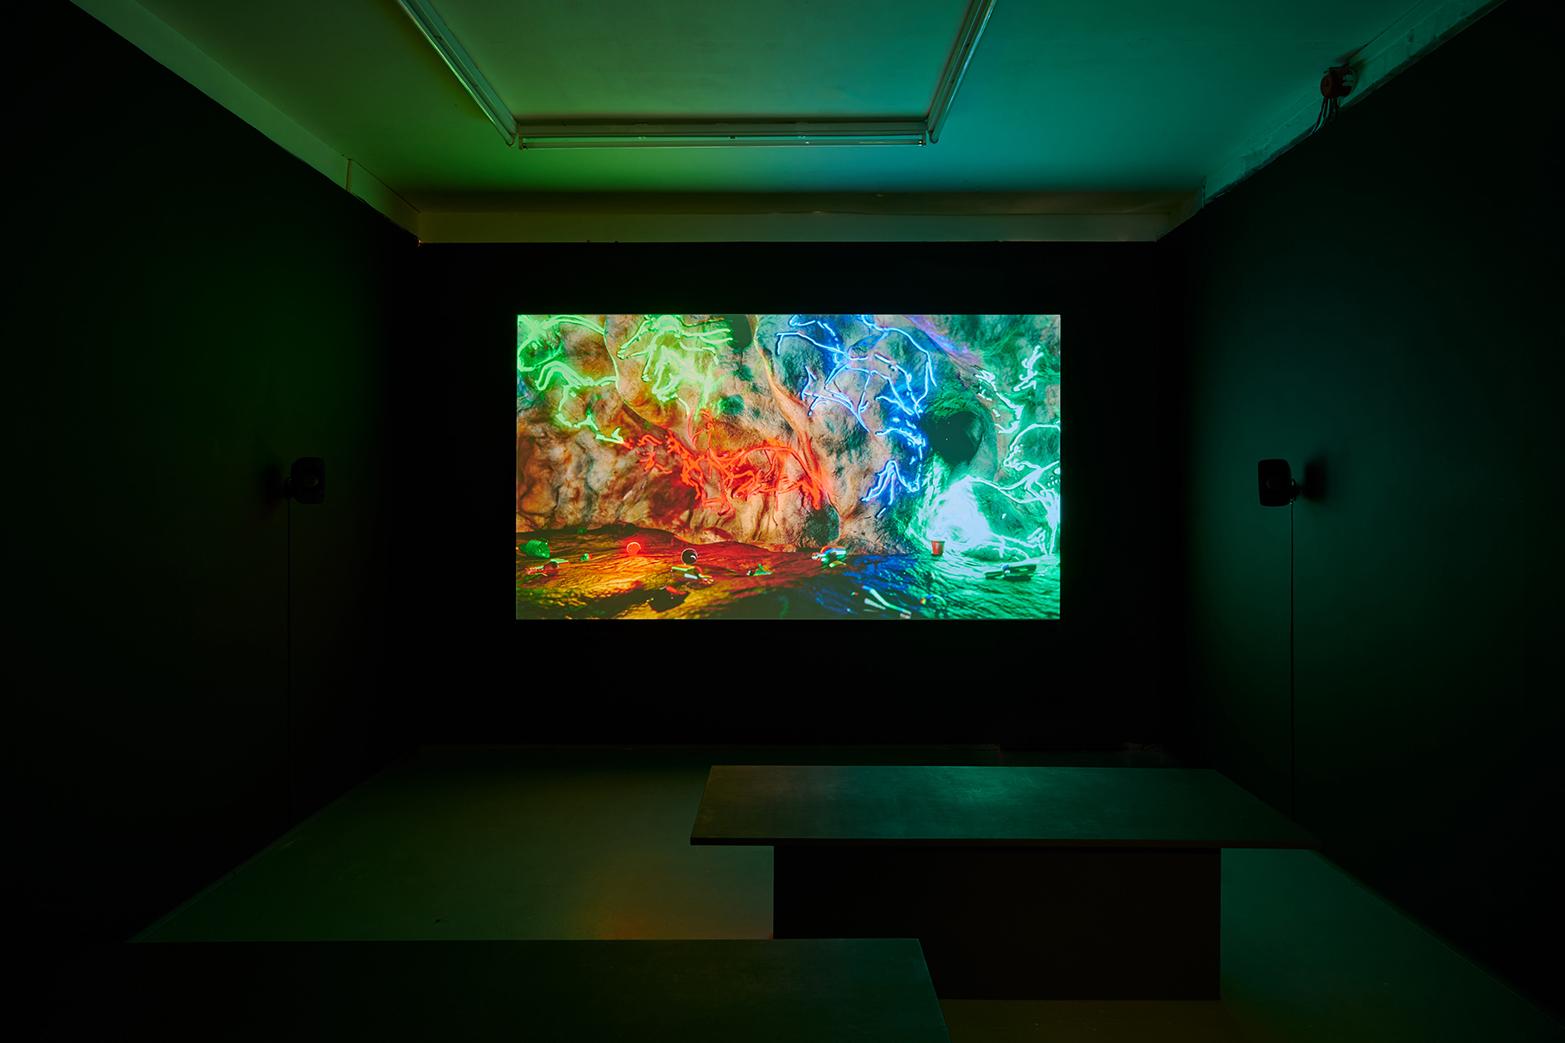 David Ferrando Giraut, The Accursed Stare, 2017. Installation view, Tenderpixel. Digital animation with 5.1 sound. 35 mins.